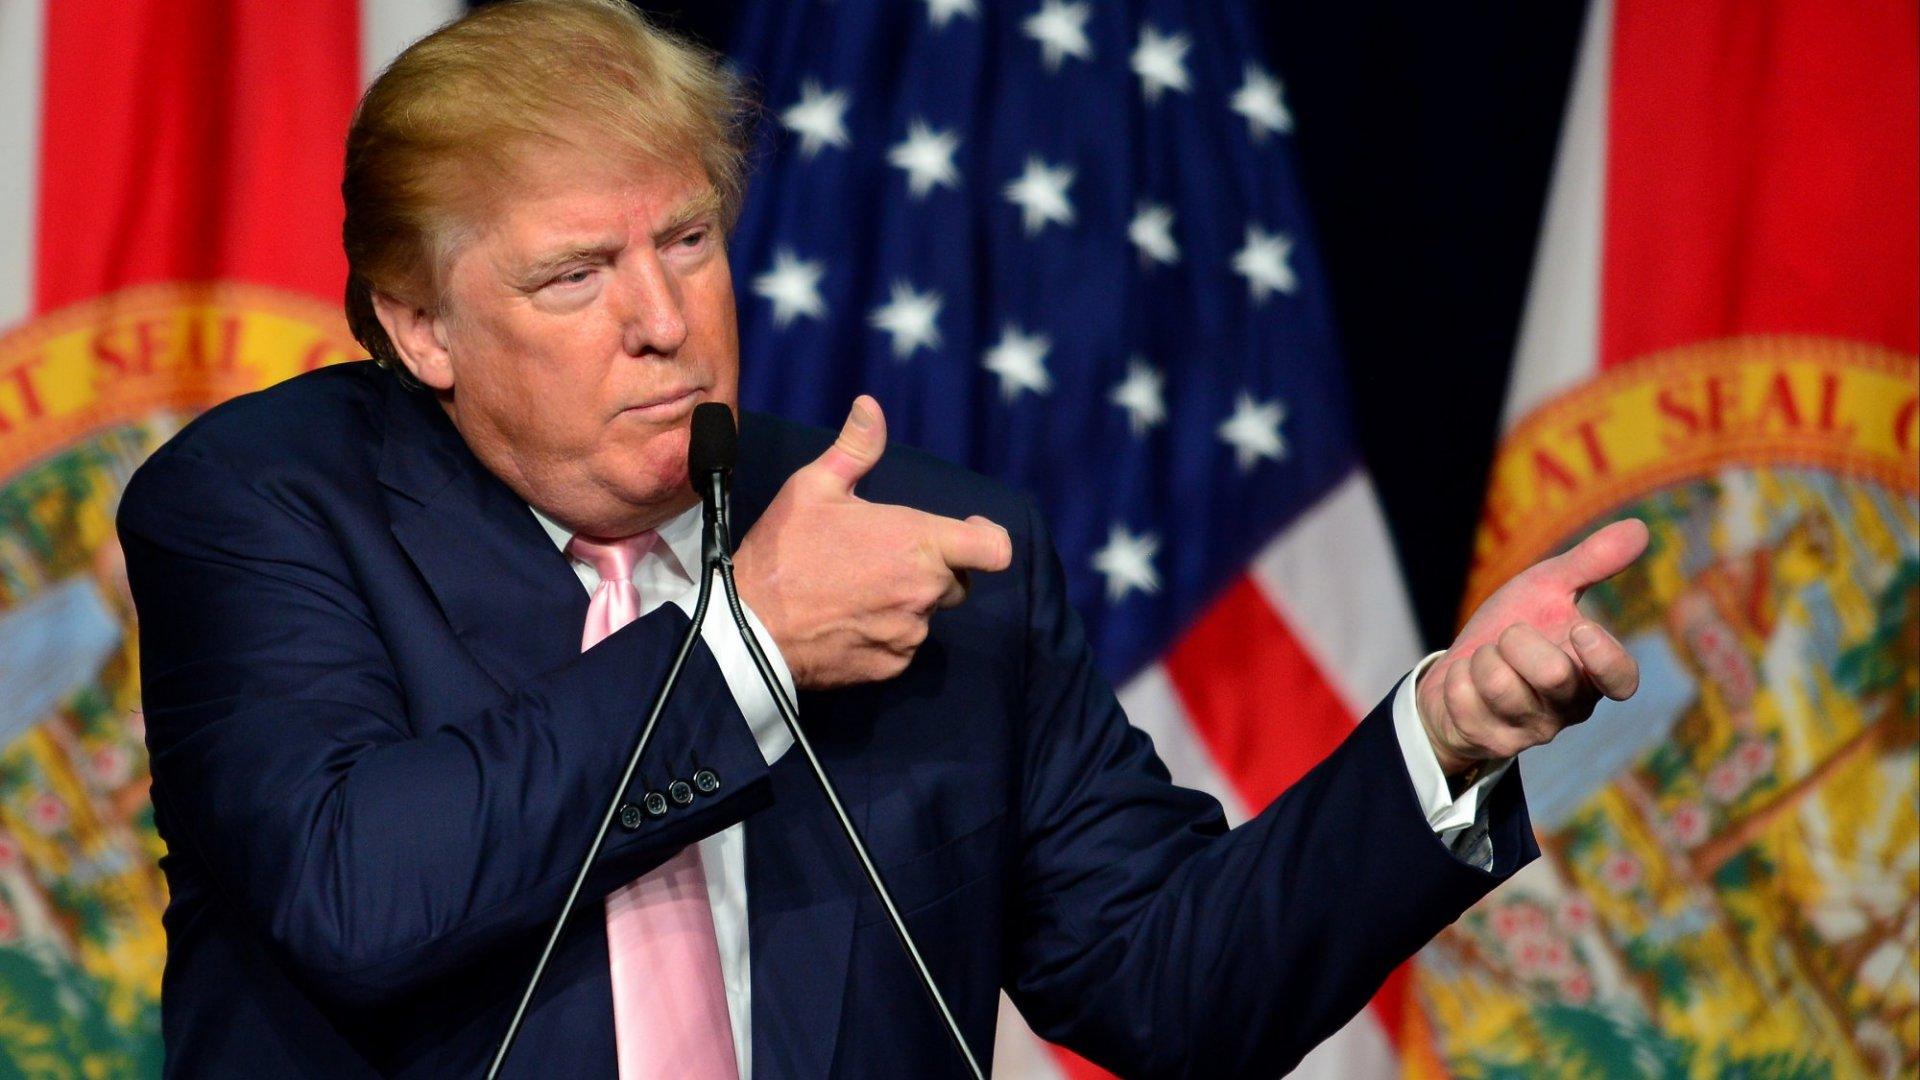 <b>TAKING AIM:</b> Donald Trump has legal marijuana in his sights.